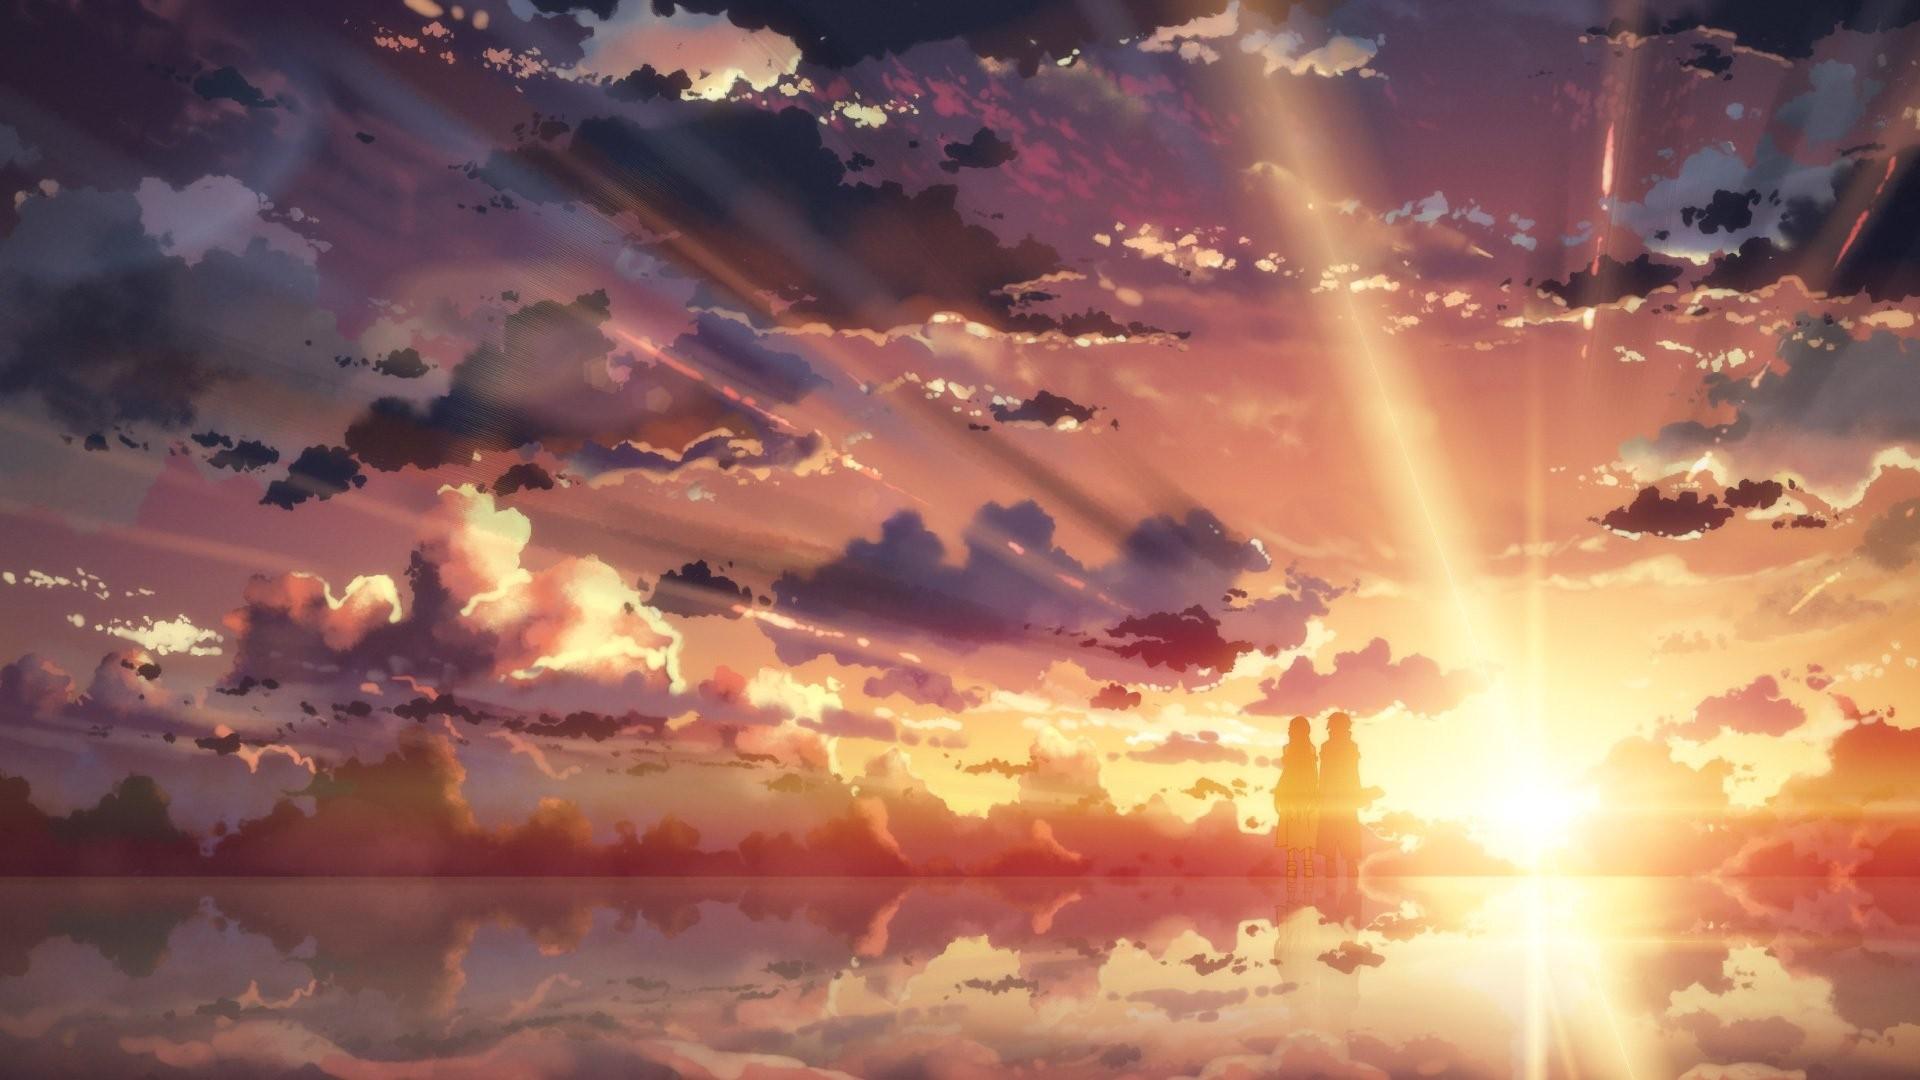 Anime Cloud wallpaper download